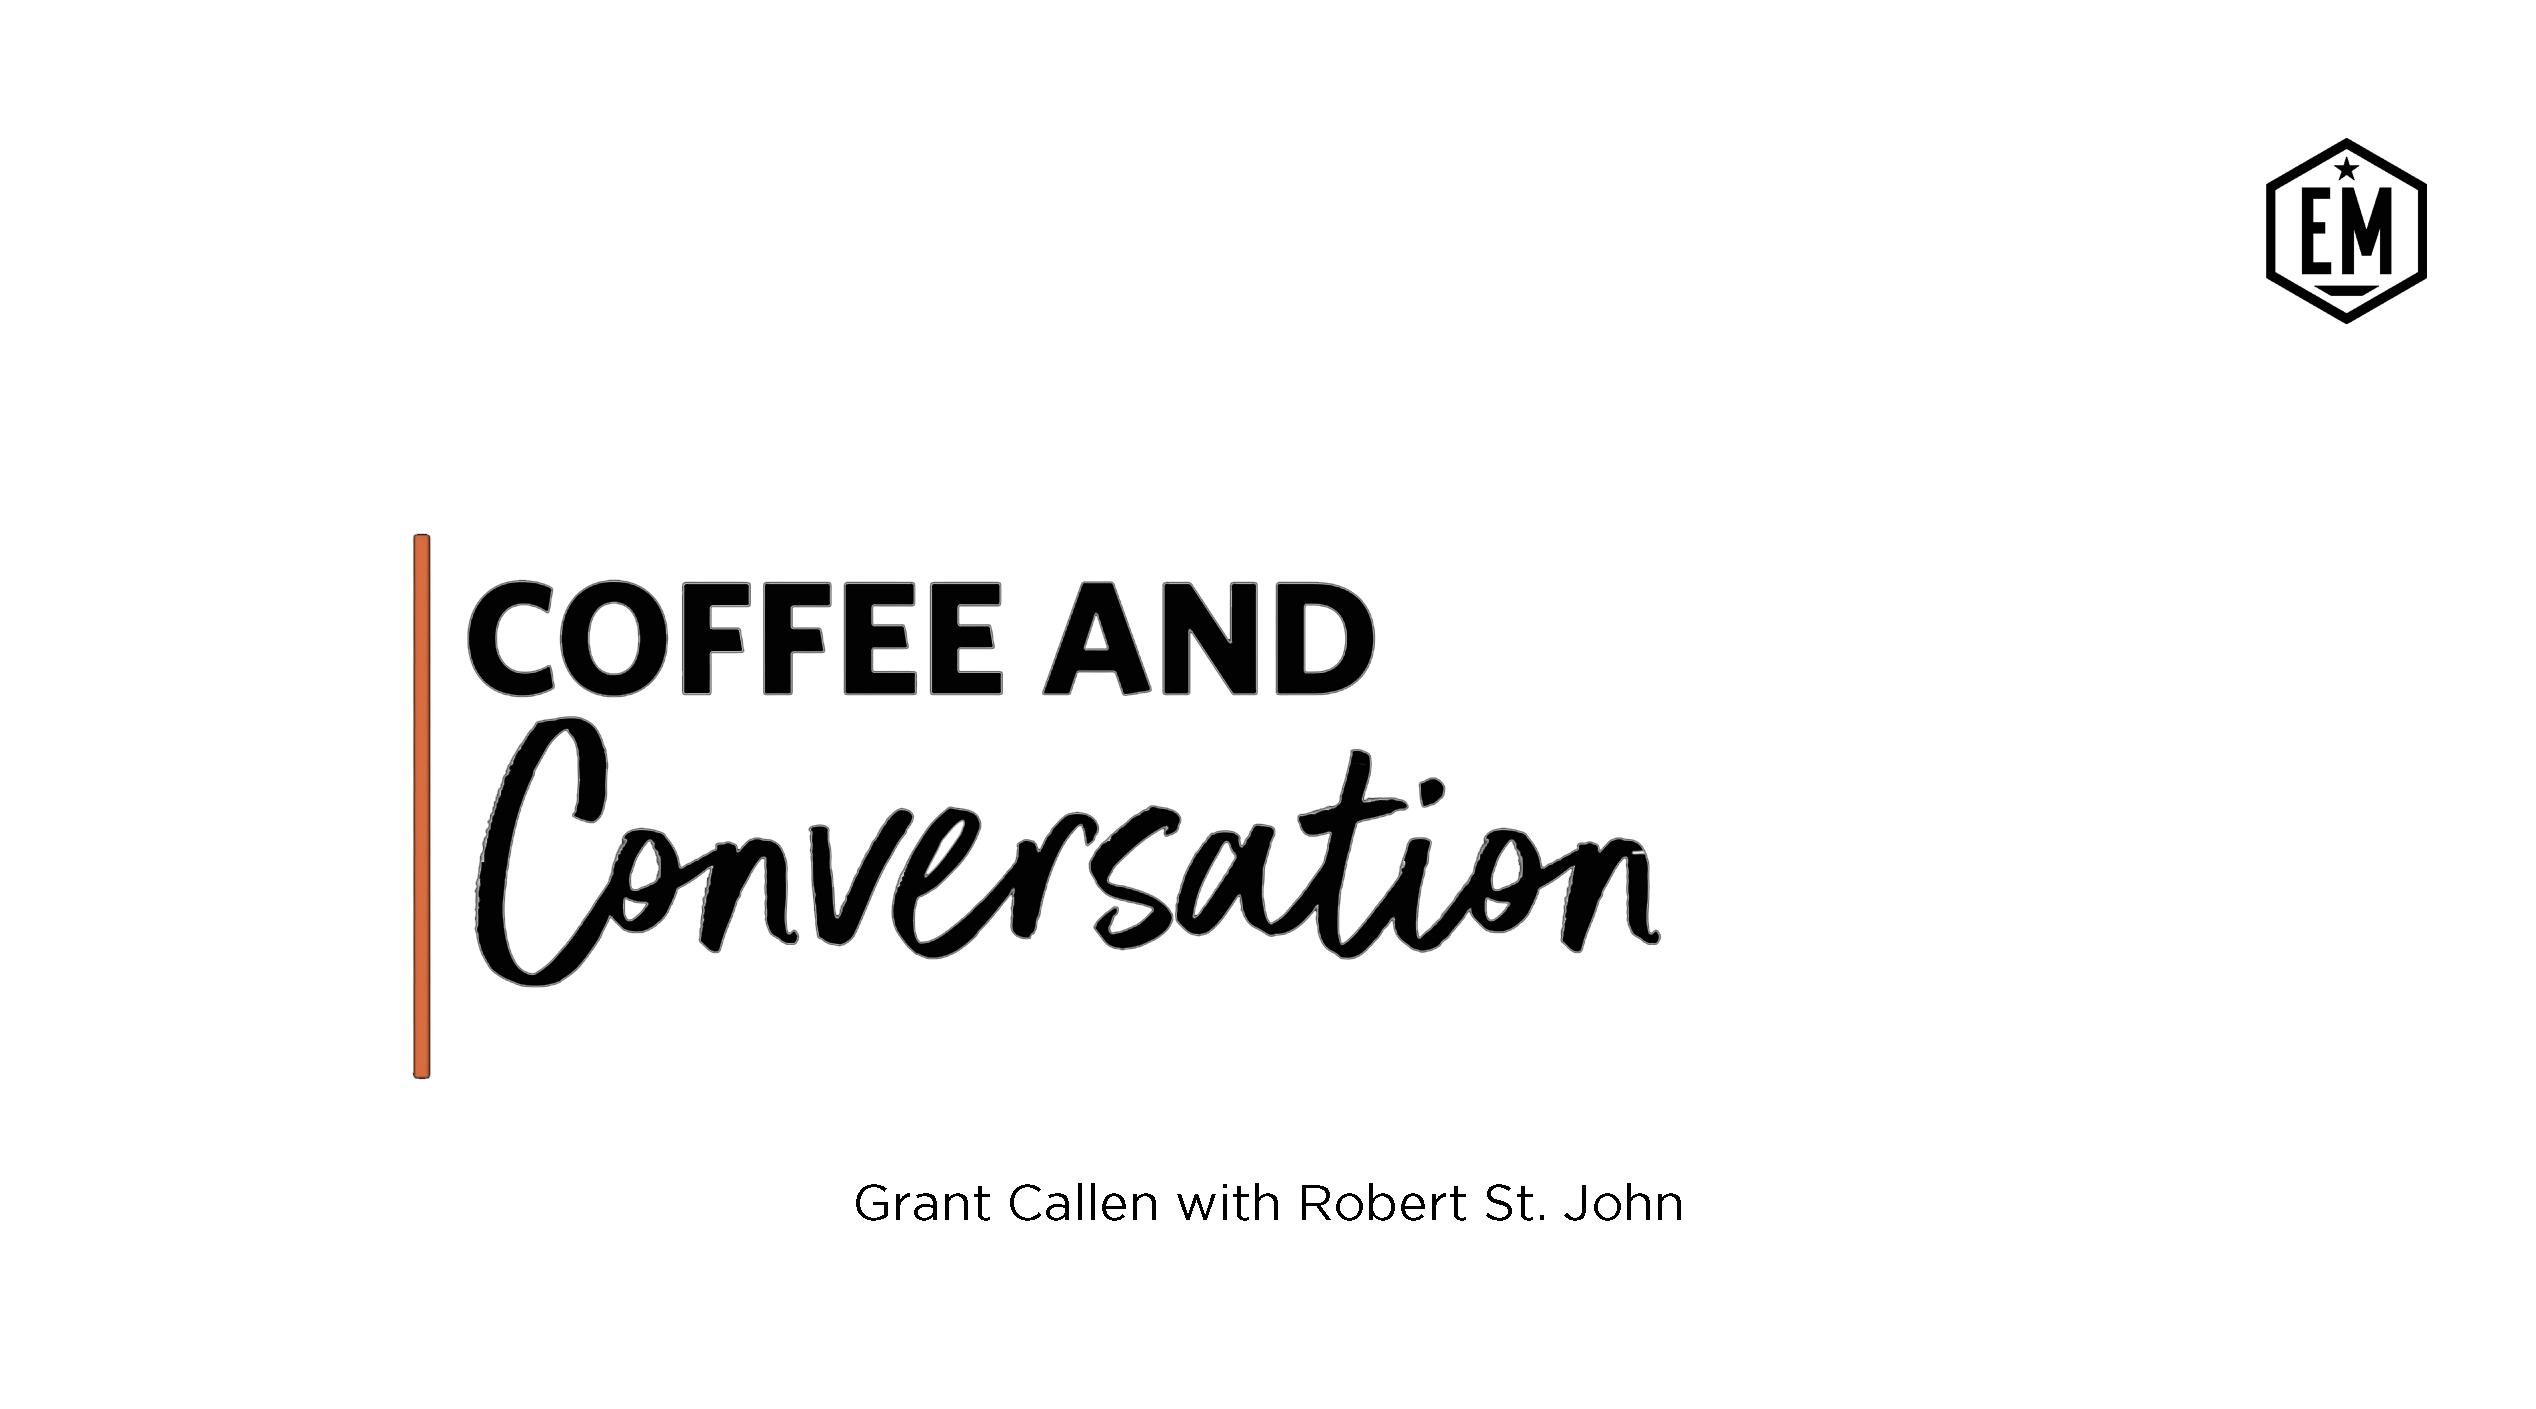 Coffee and Conversation RSJ